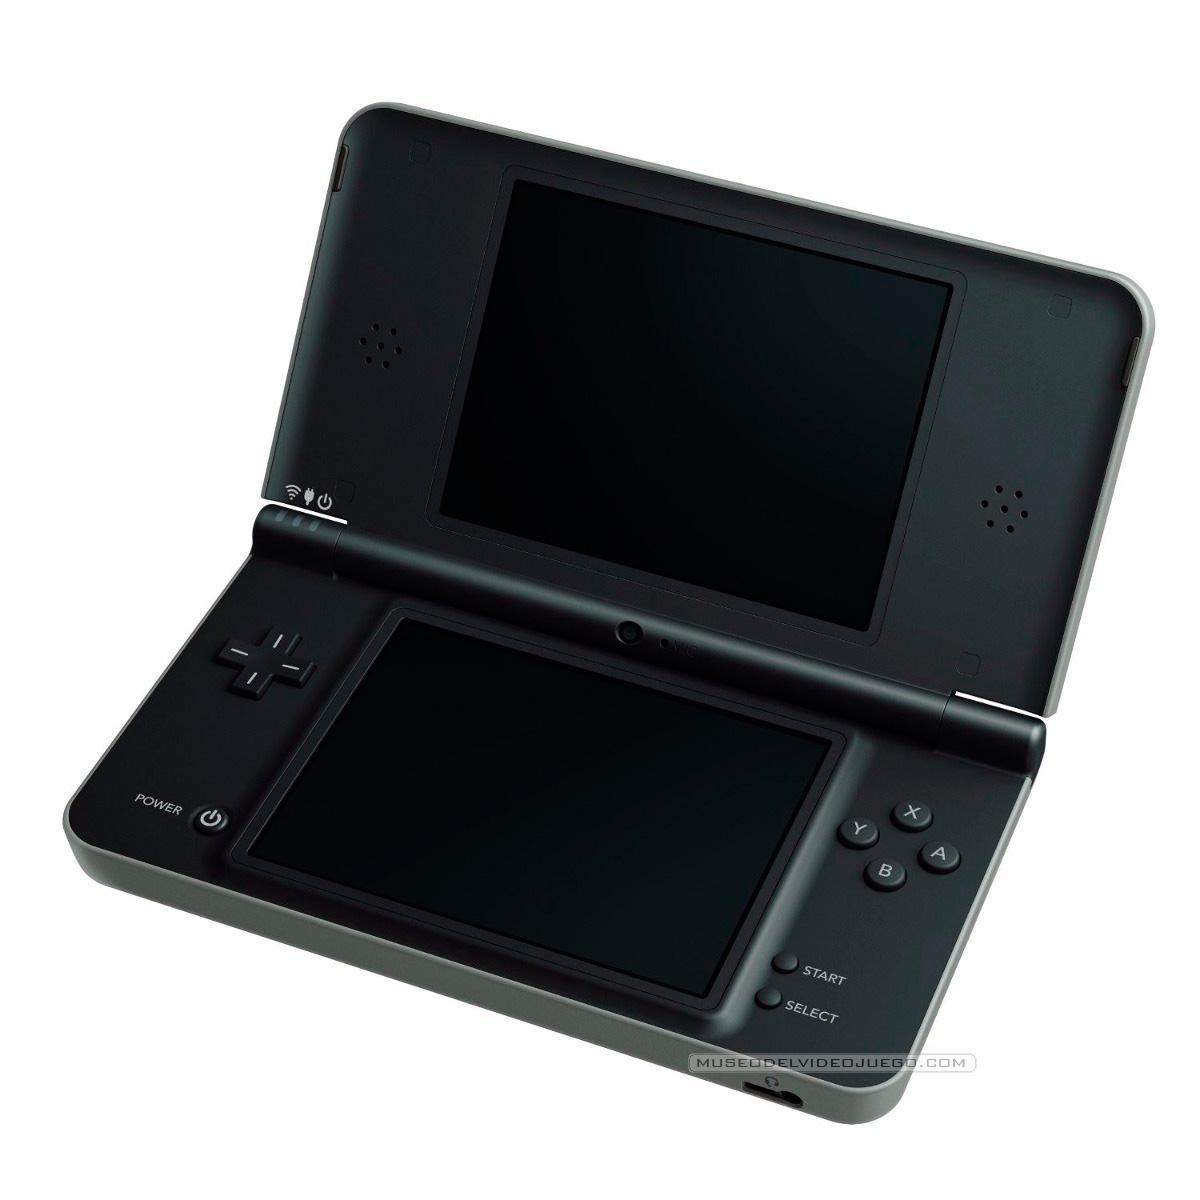 Nintendo DSi XL Black